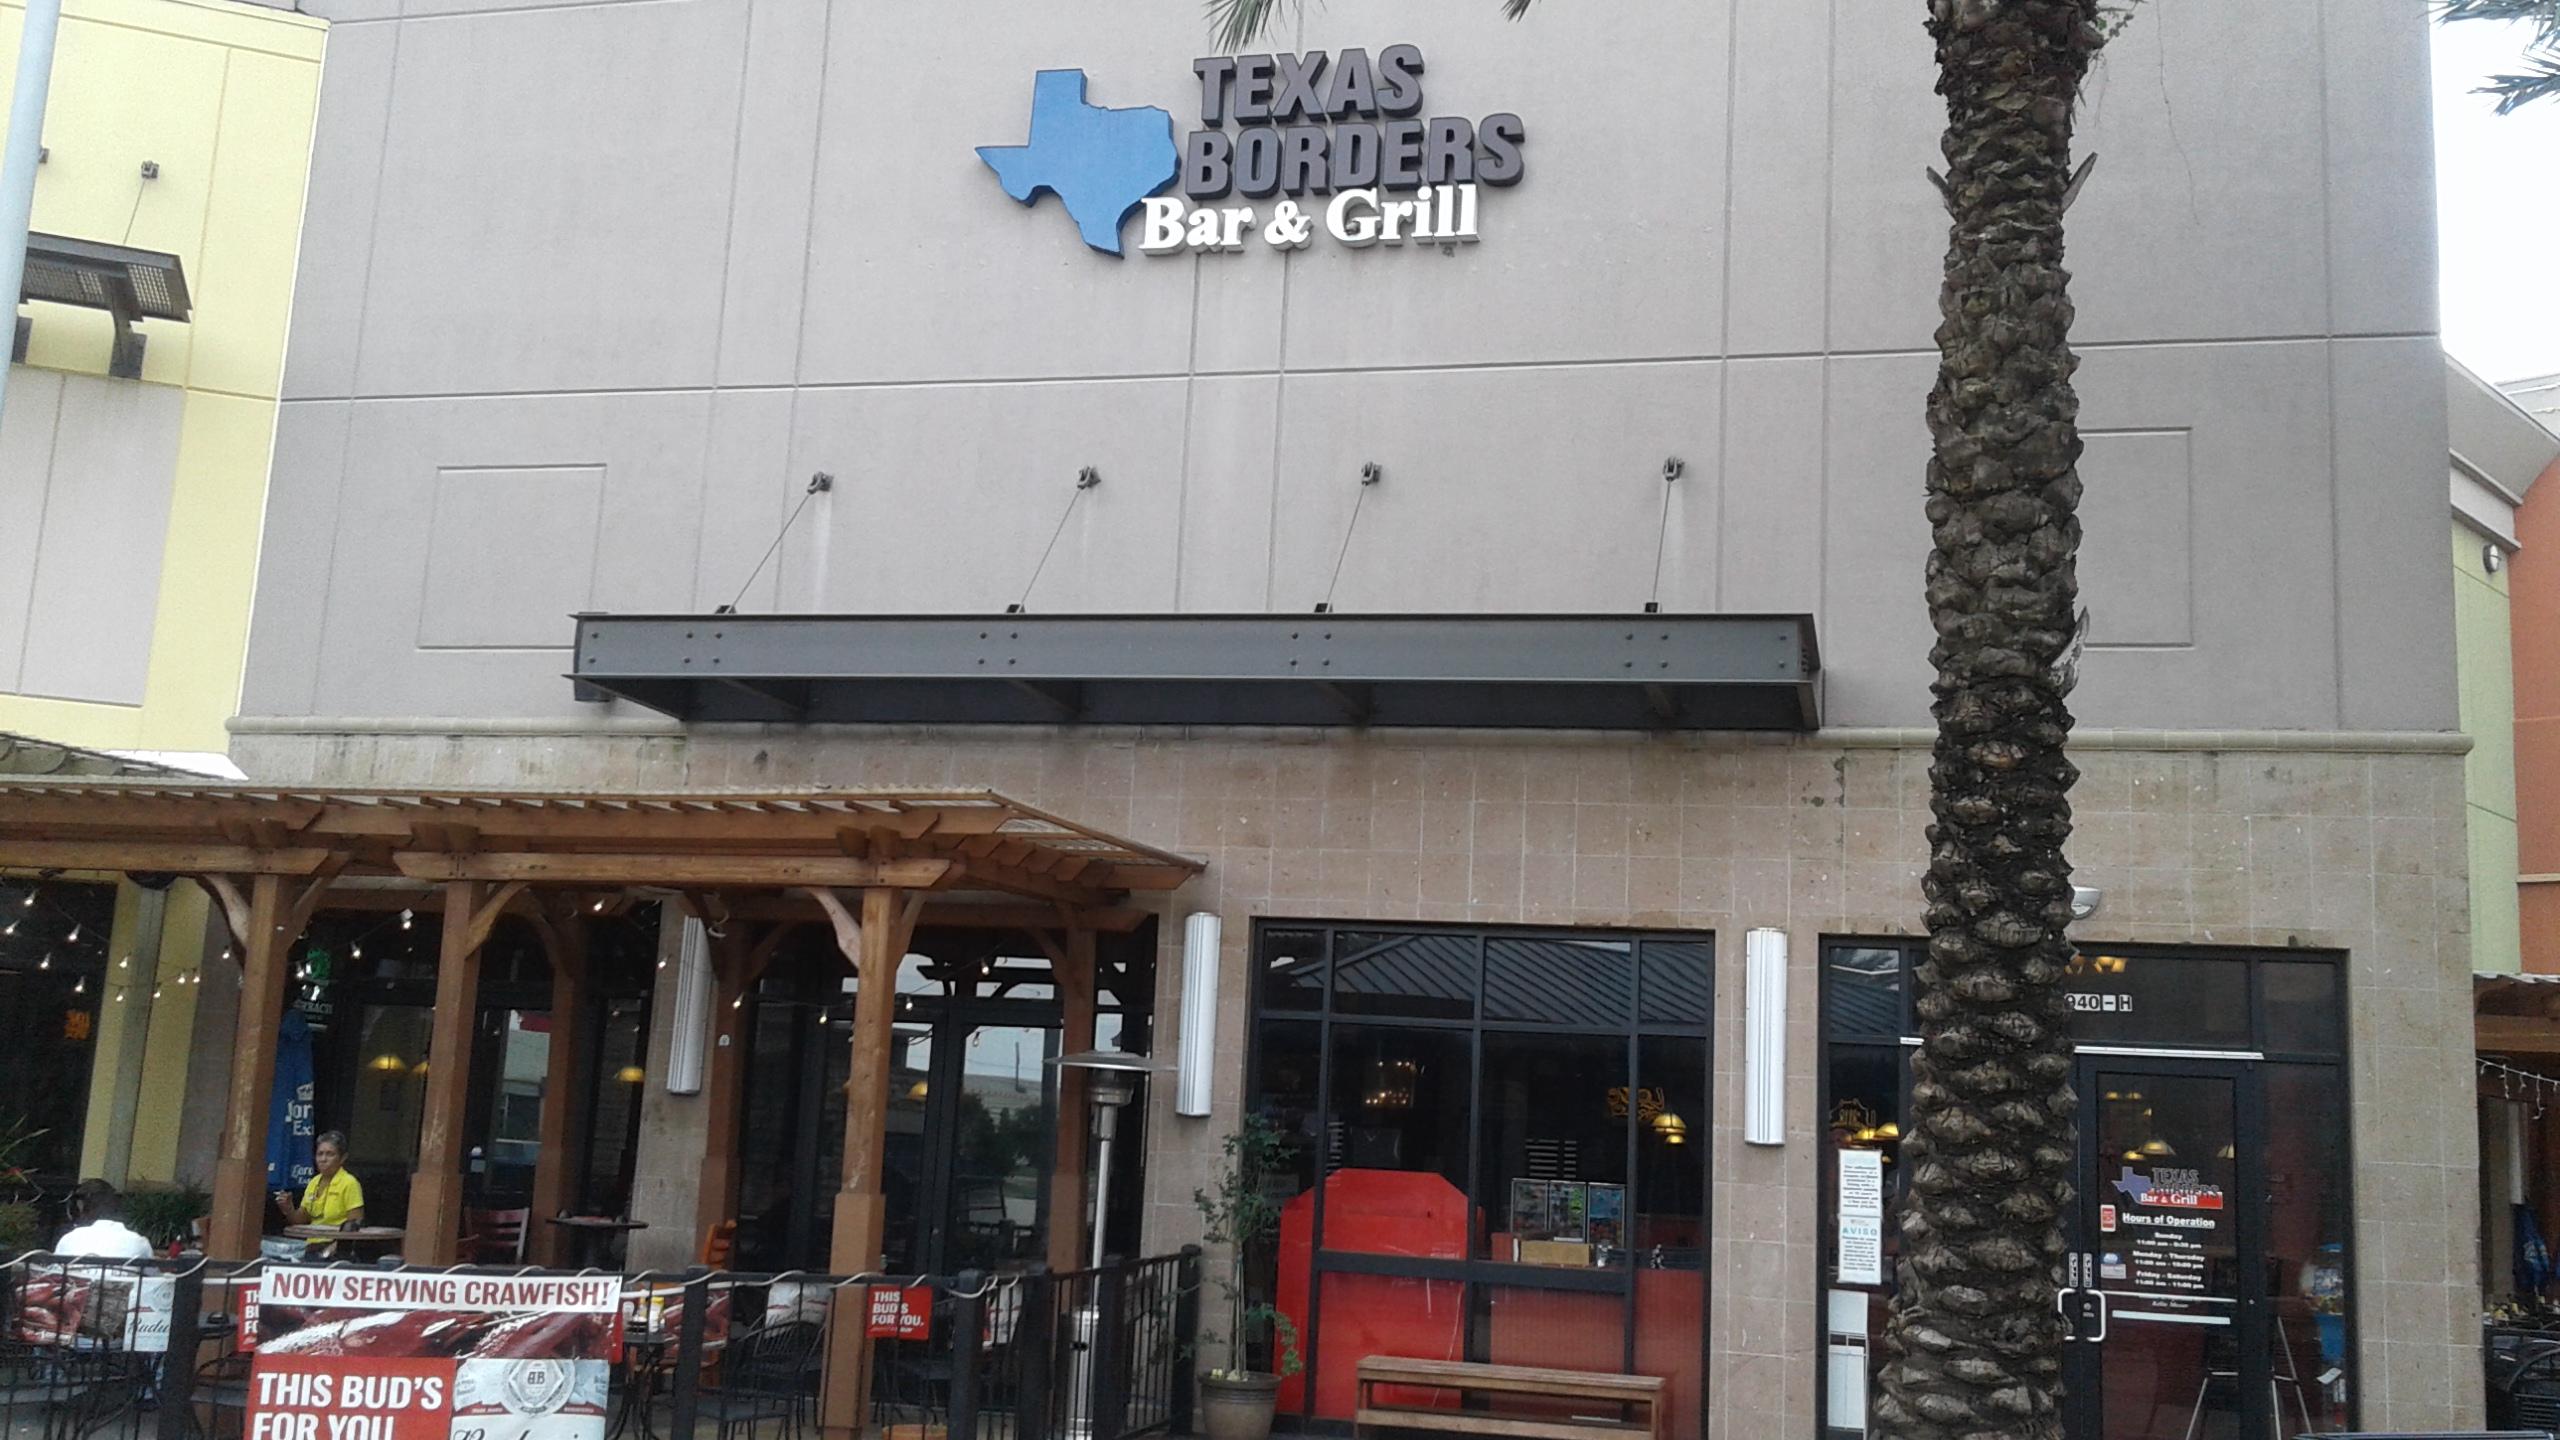 Texas Borders Bar & Grill | Restaurants at 20940 Katy Fwy - Katy TX - Reviews - Photos - Phone Number